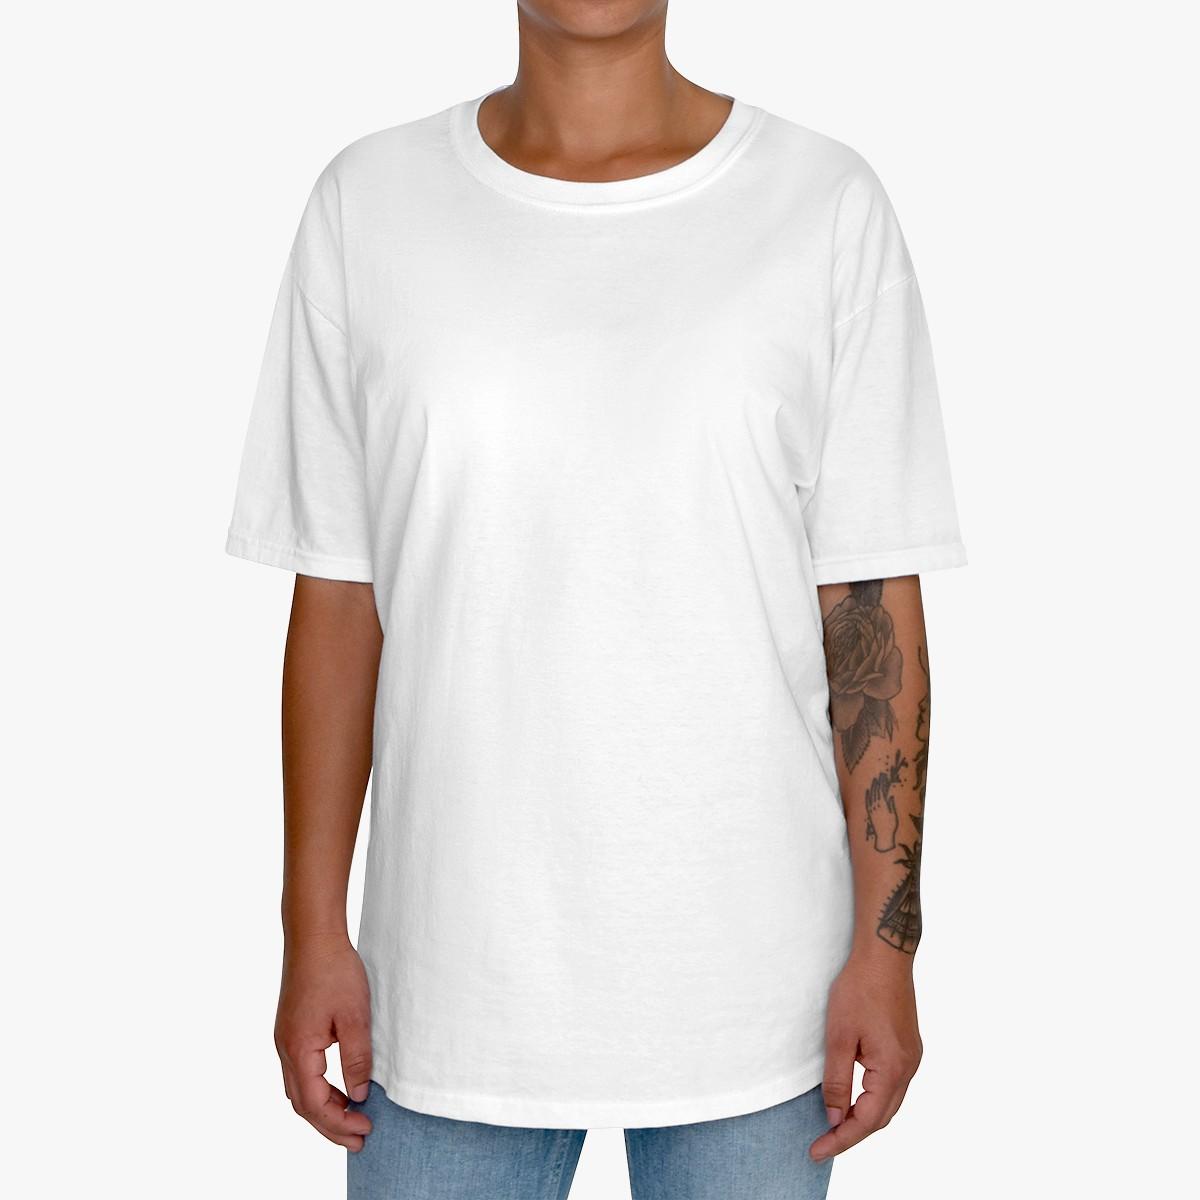 Print On Demand Champion T-shirts Womens T-shirt